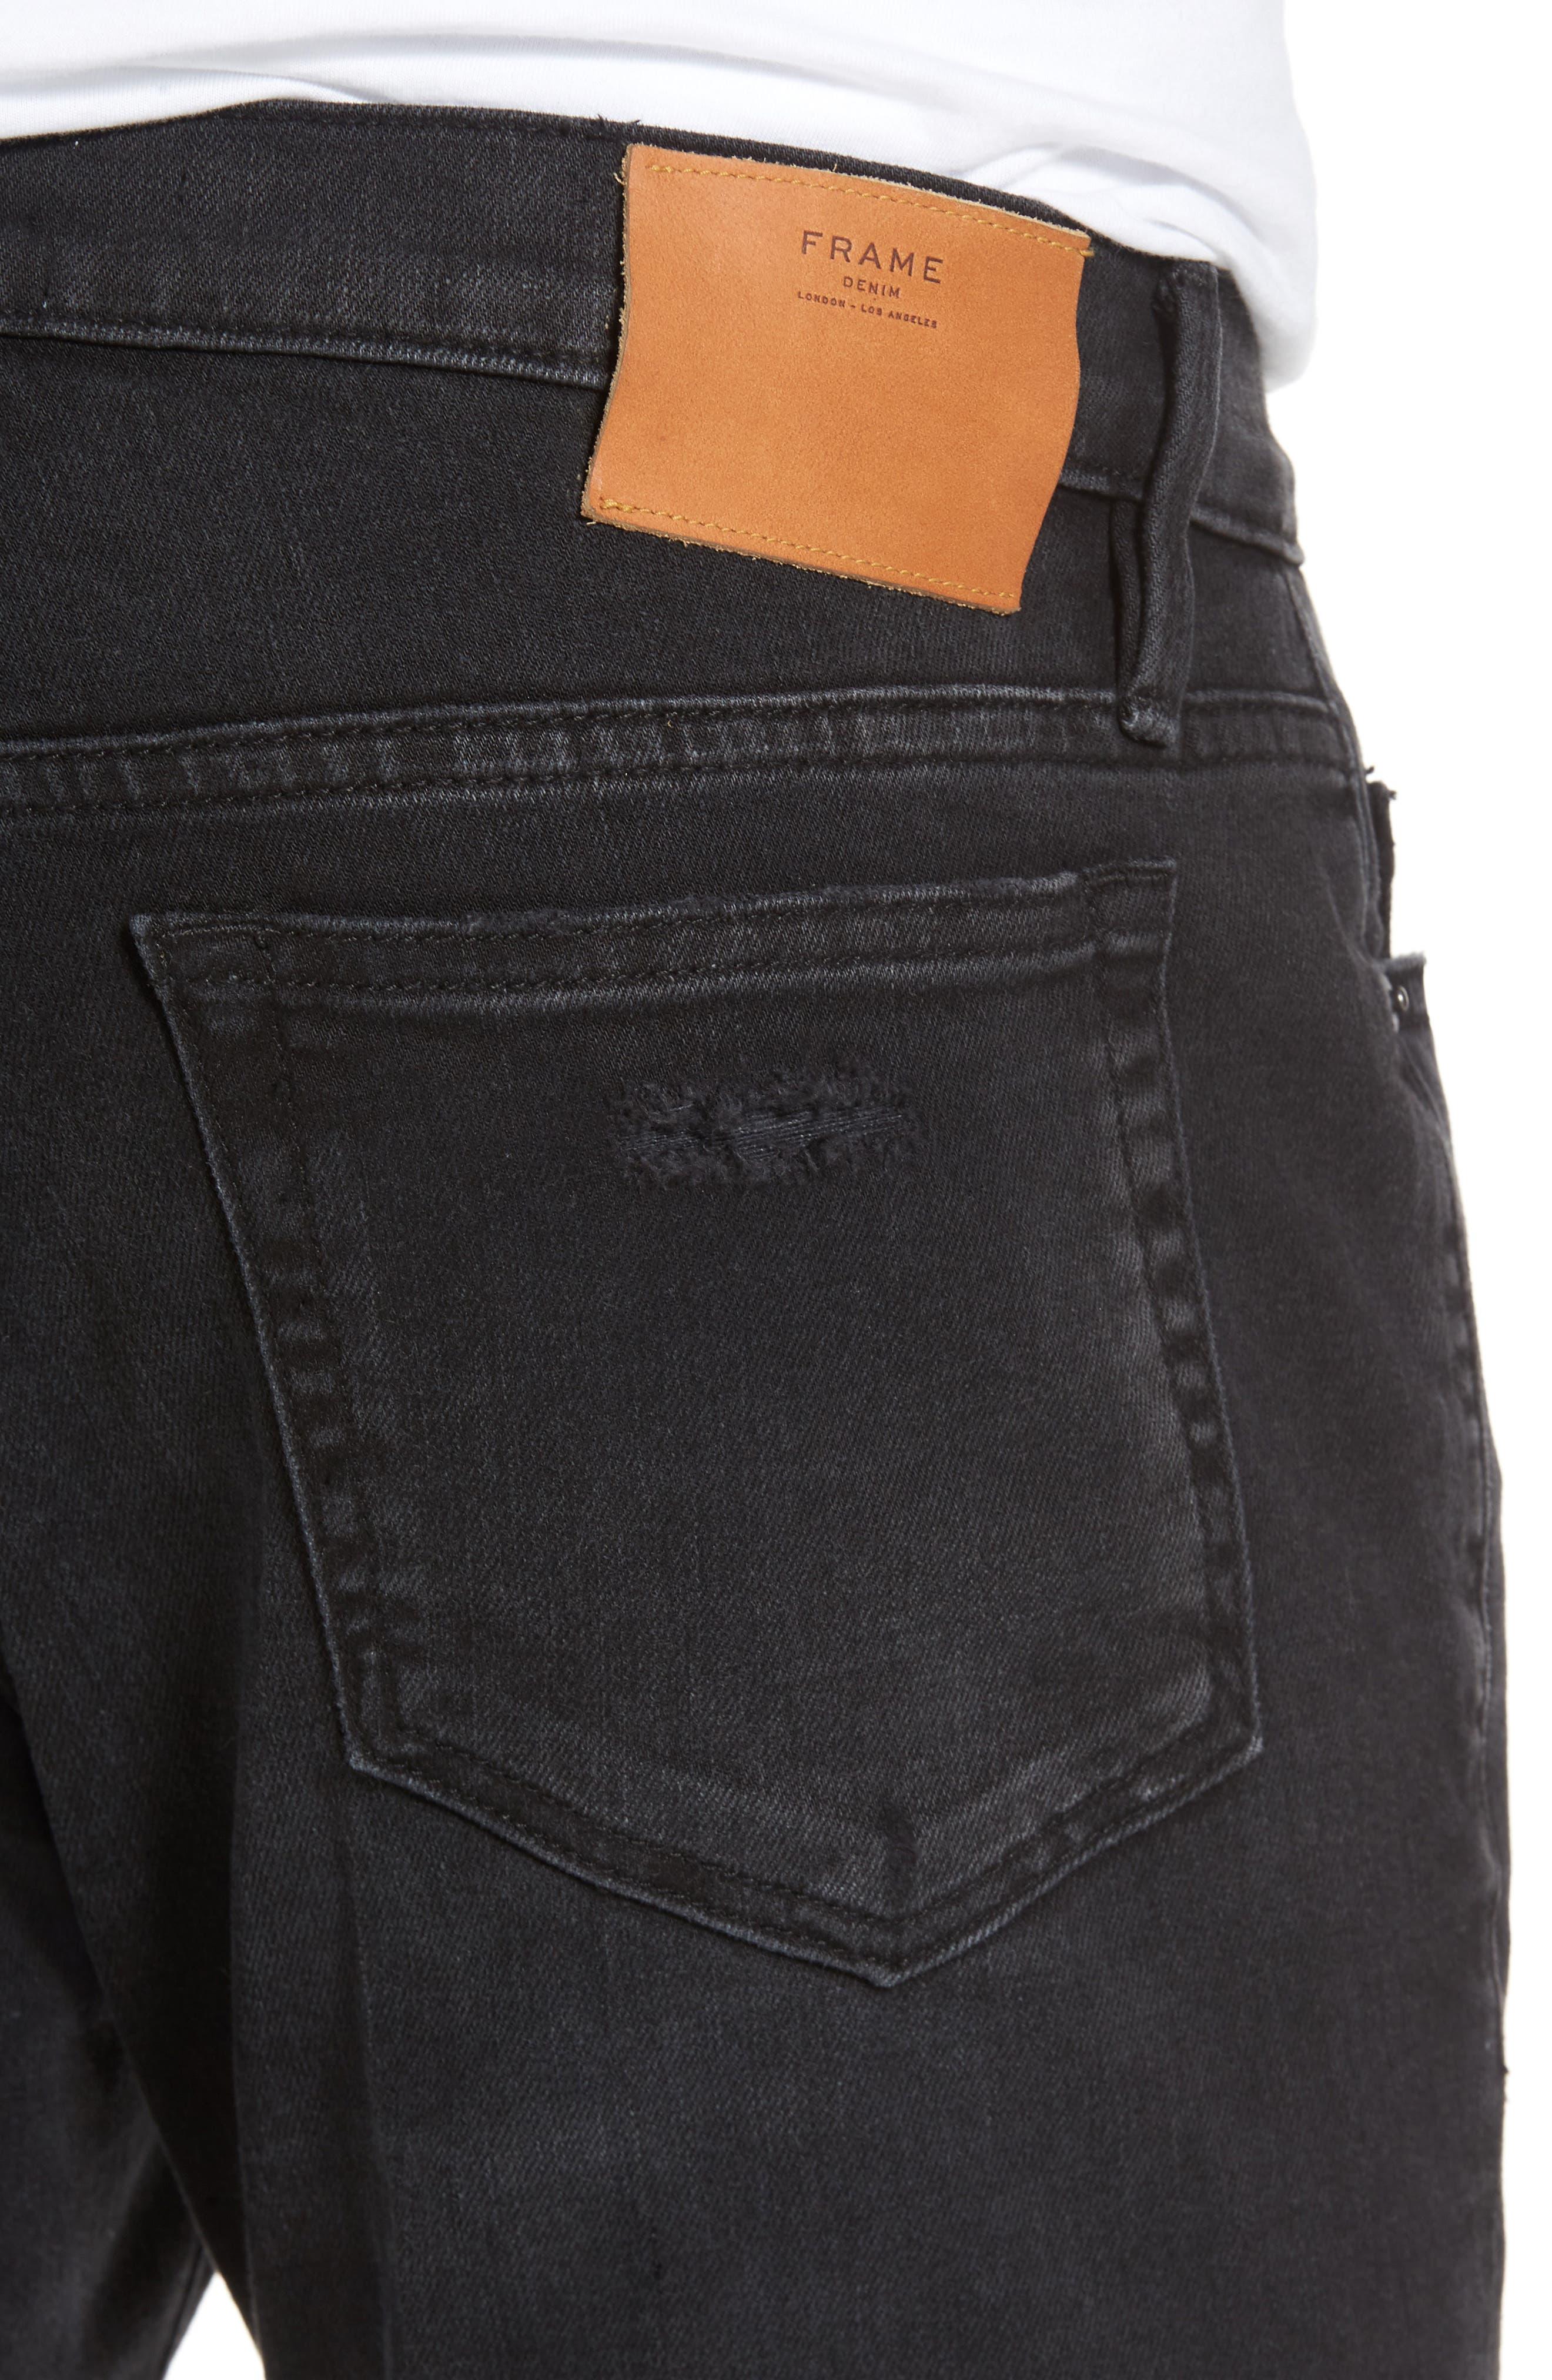 L'Homme Skinny Fit Jeans,                             Alternate thumbnail 4, color,                             001